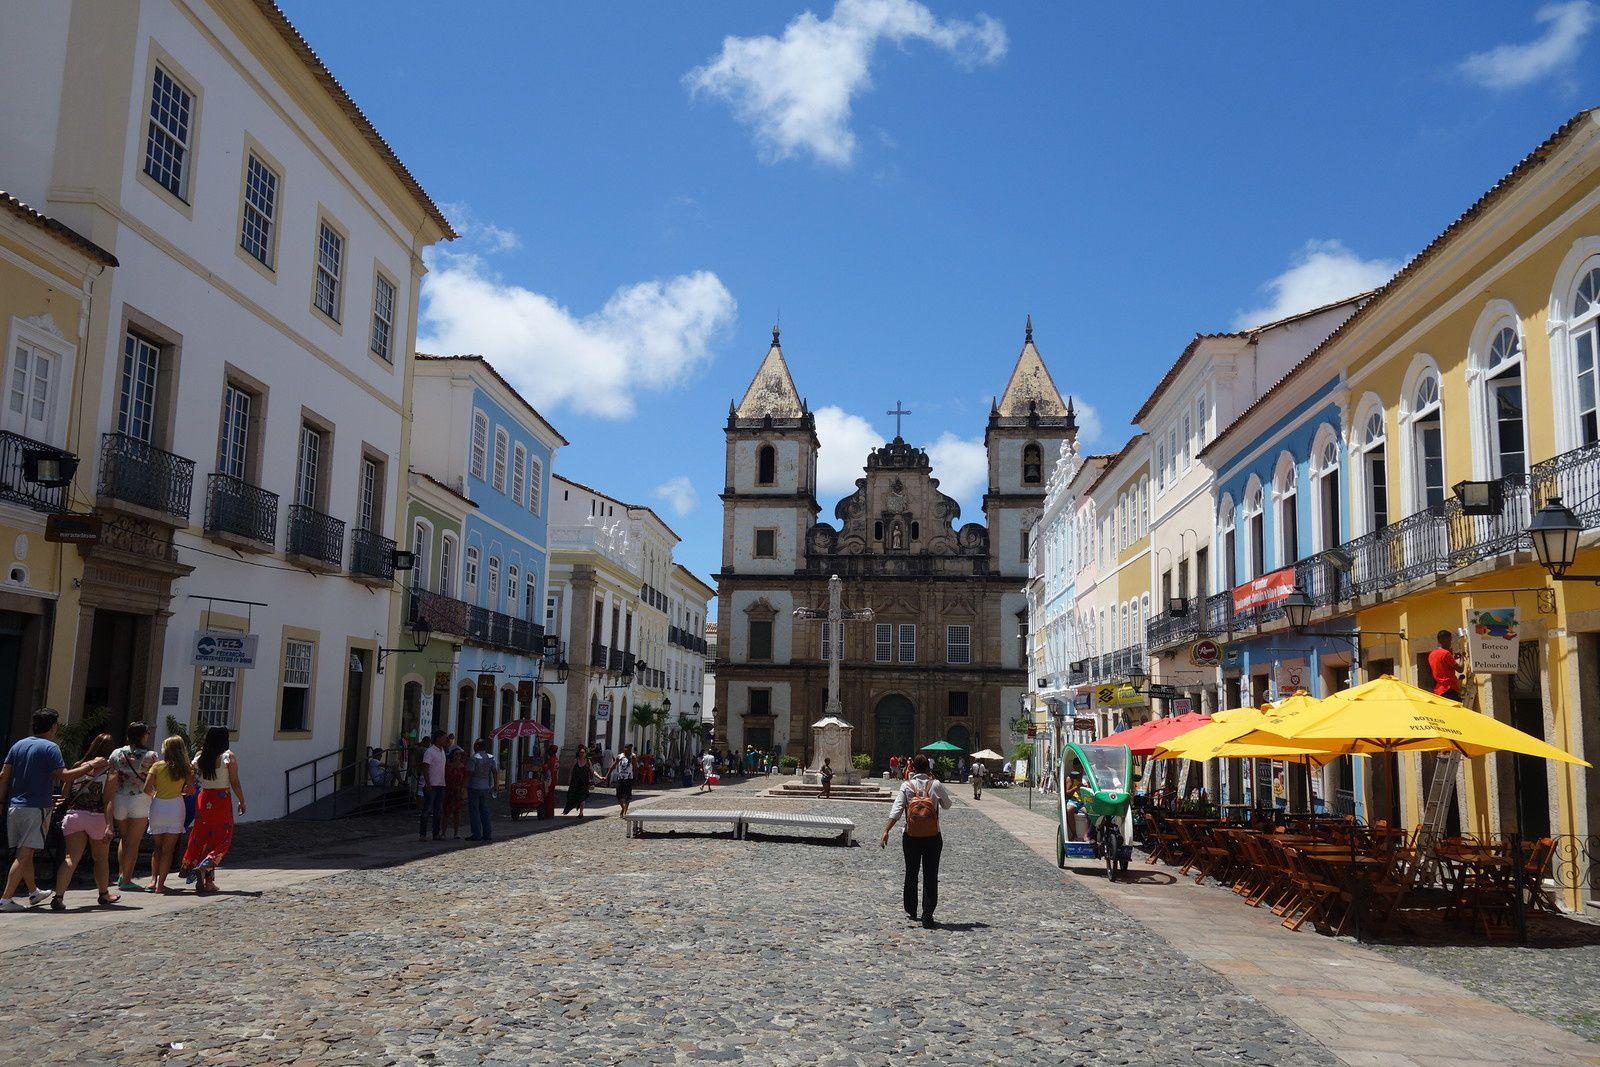 Place du Terreiro de Jesus, quartier du Pelourinho, dans le centre historique de Salvador (État de Bahia).